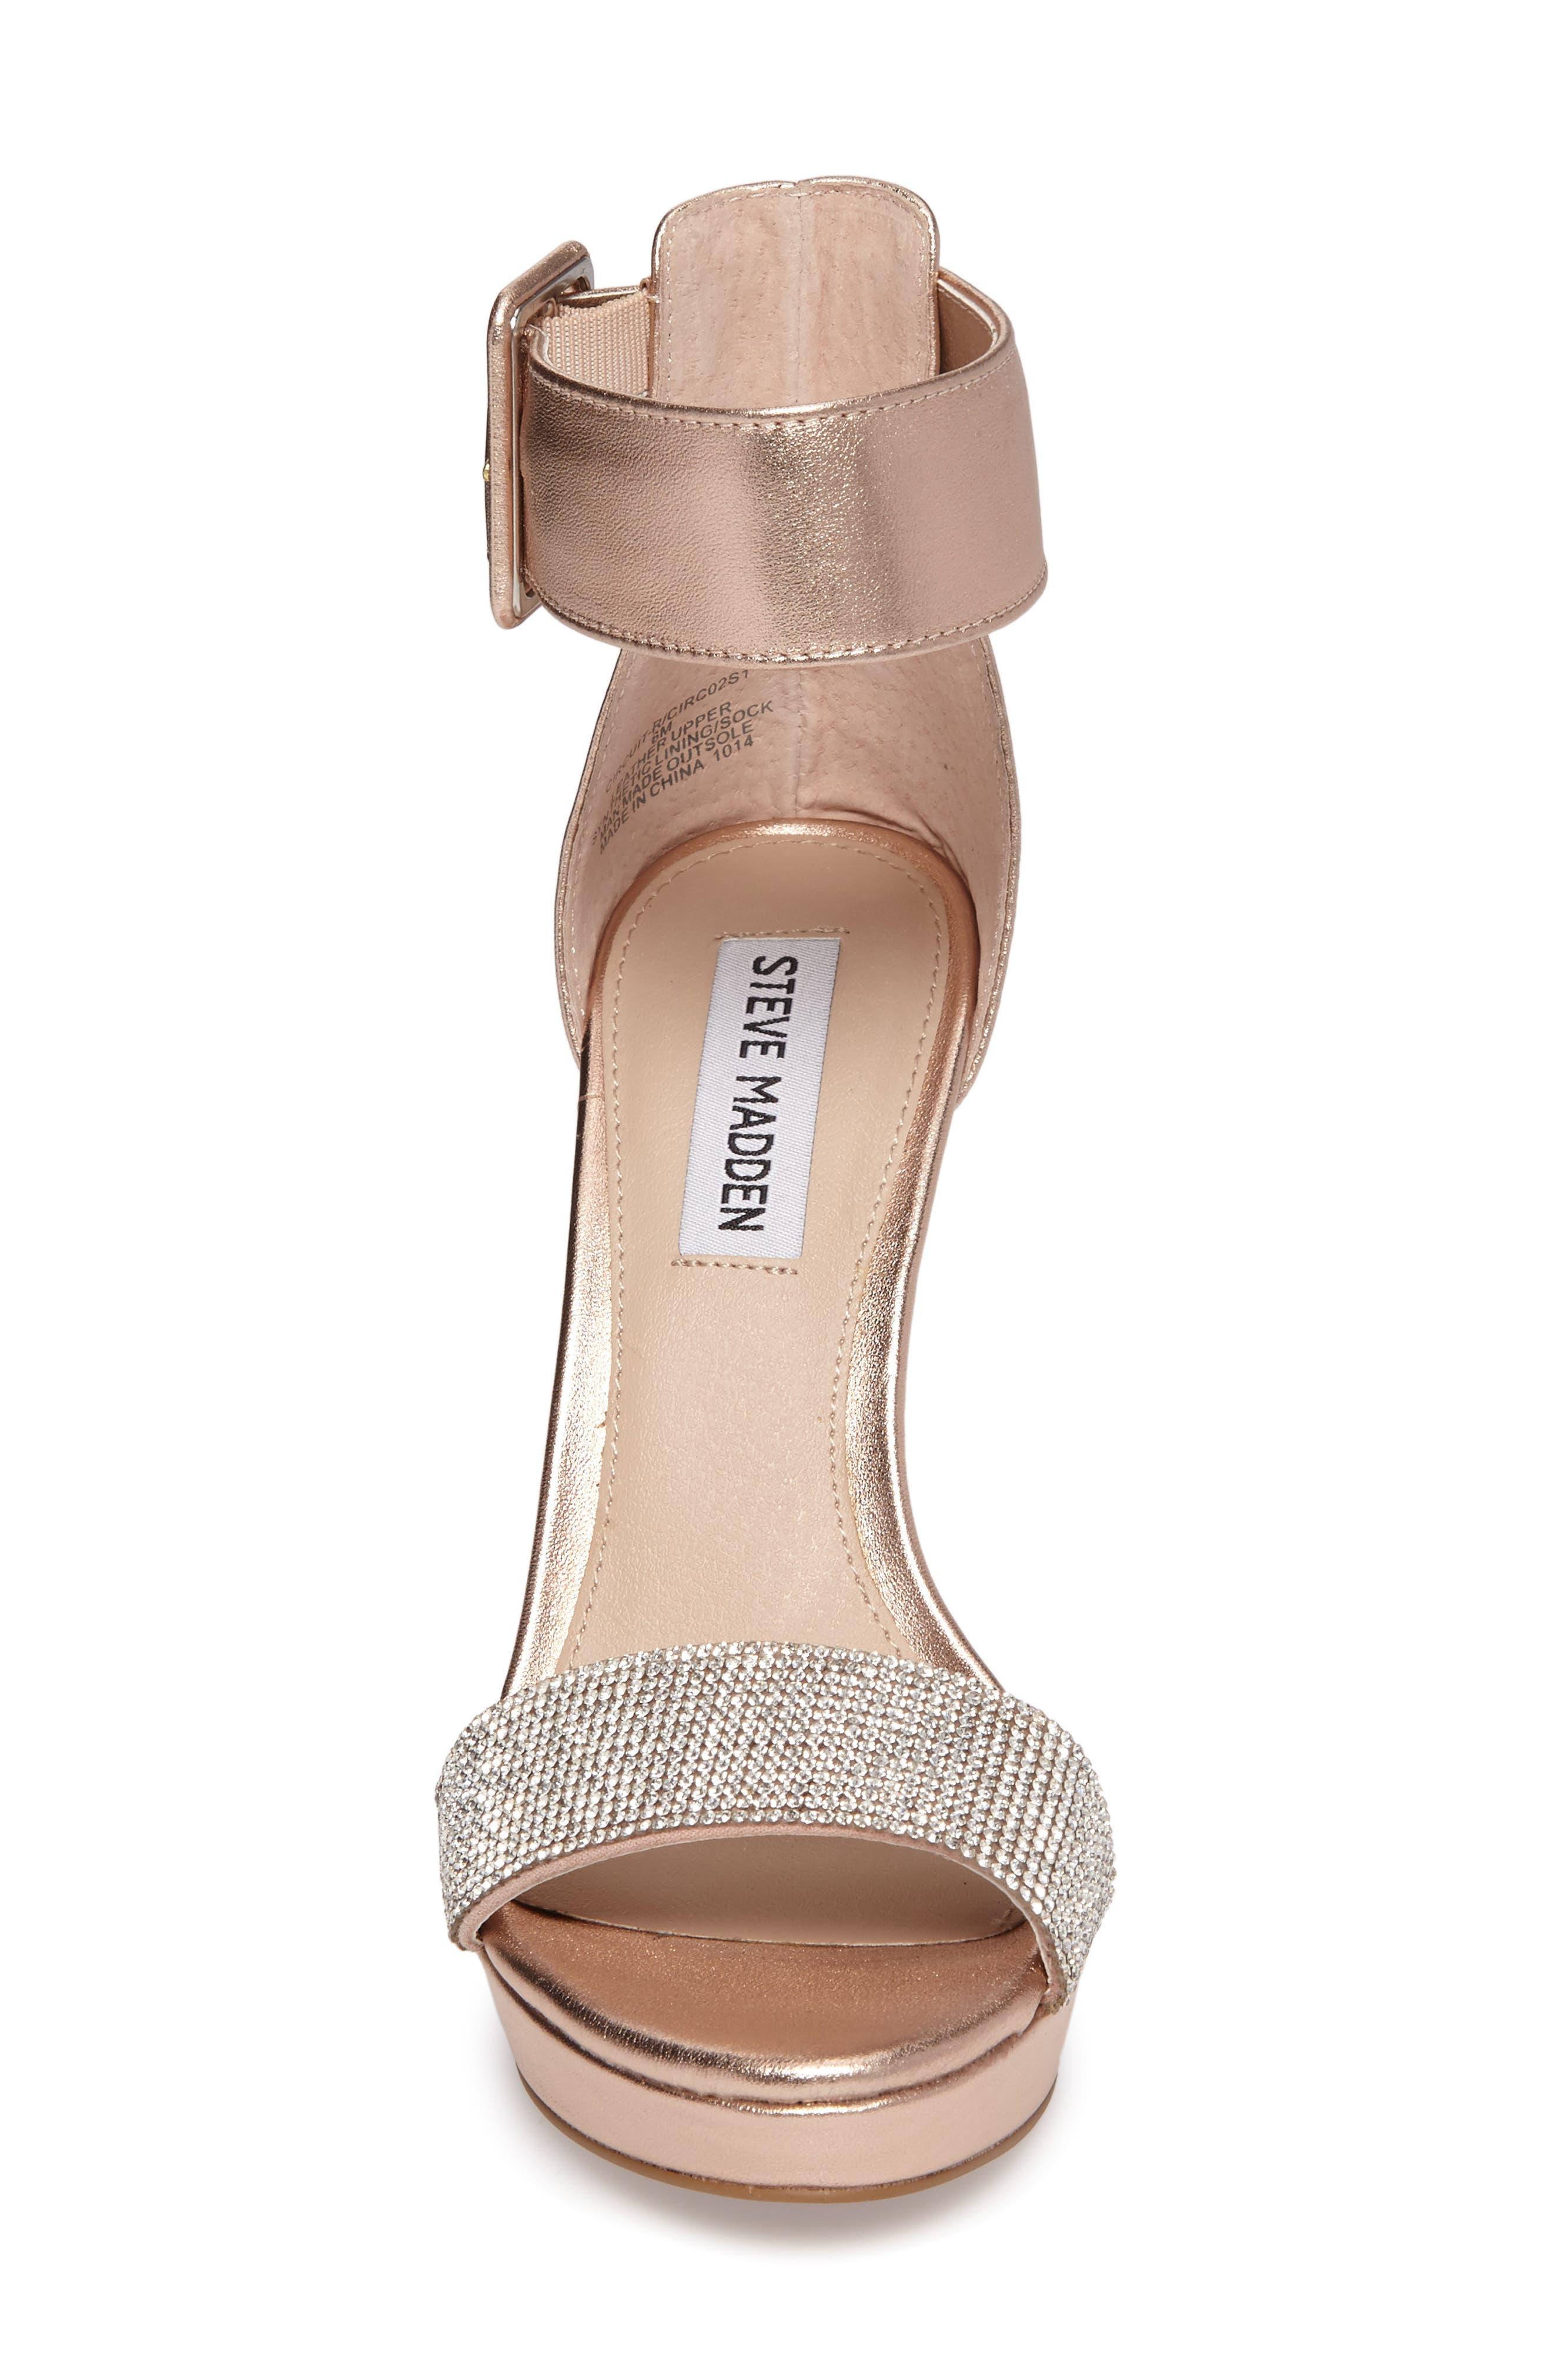 Circuit Sandal,                             Alternate thumbnail 4, color,                             Rose Gold Leather